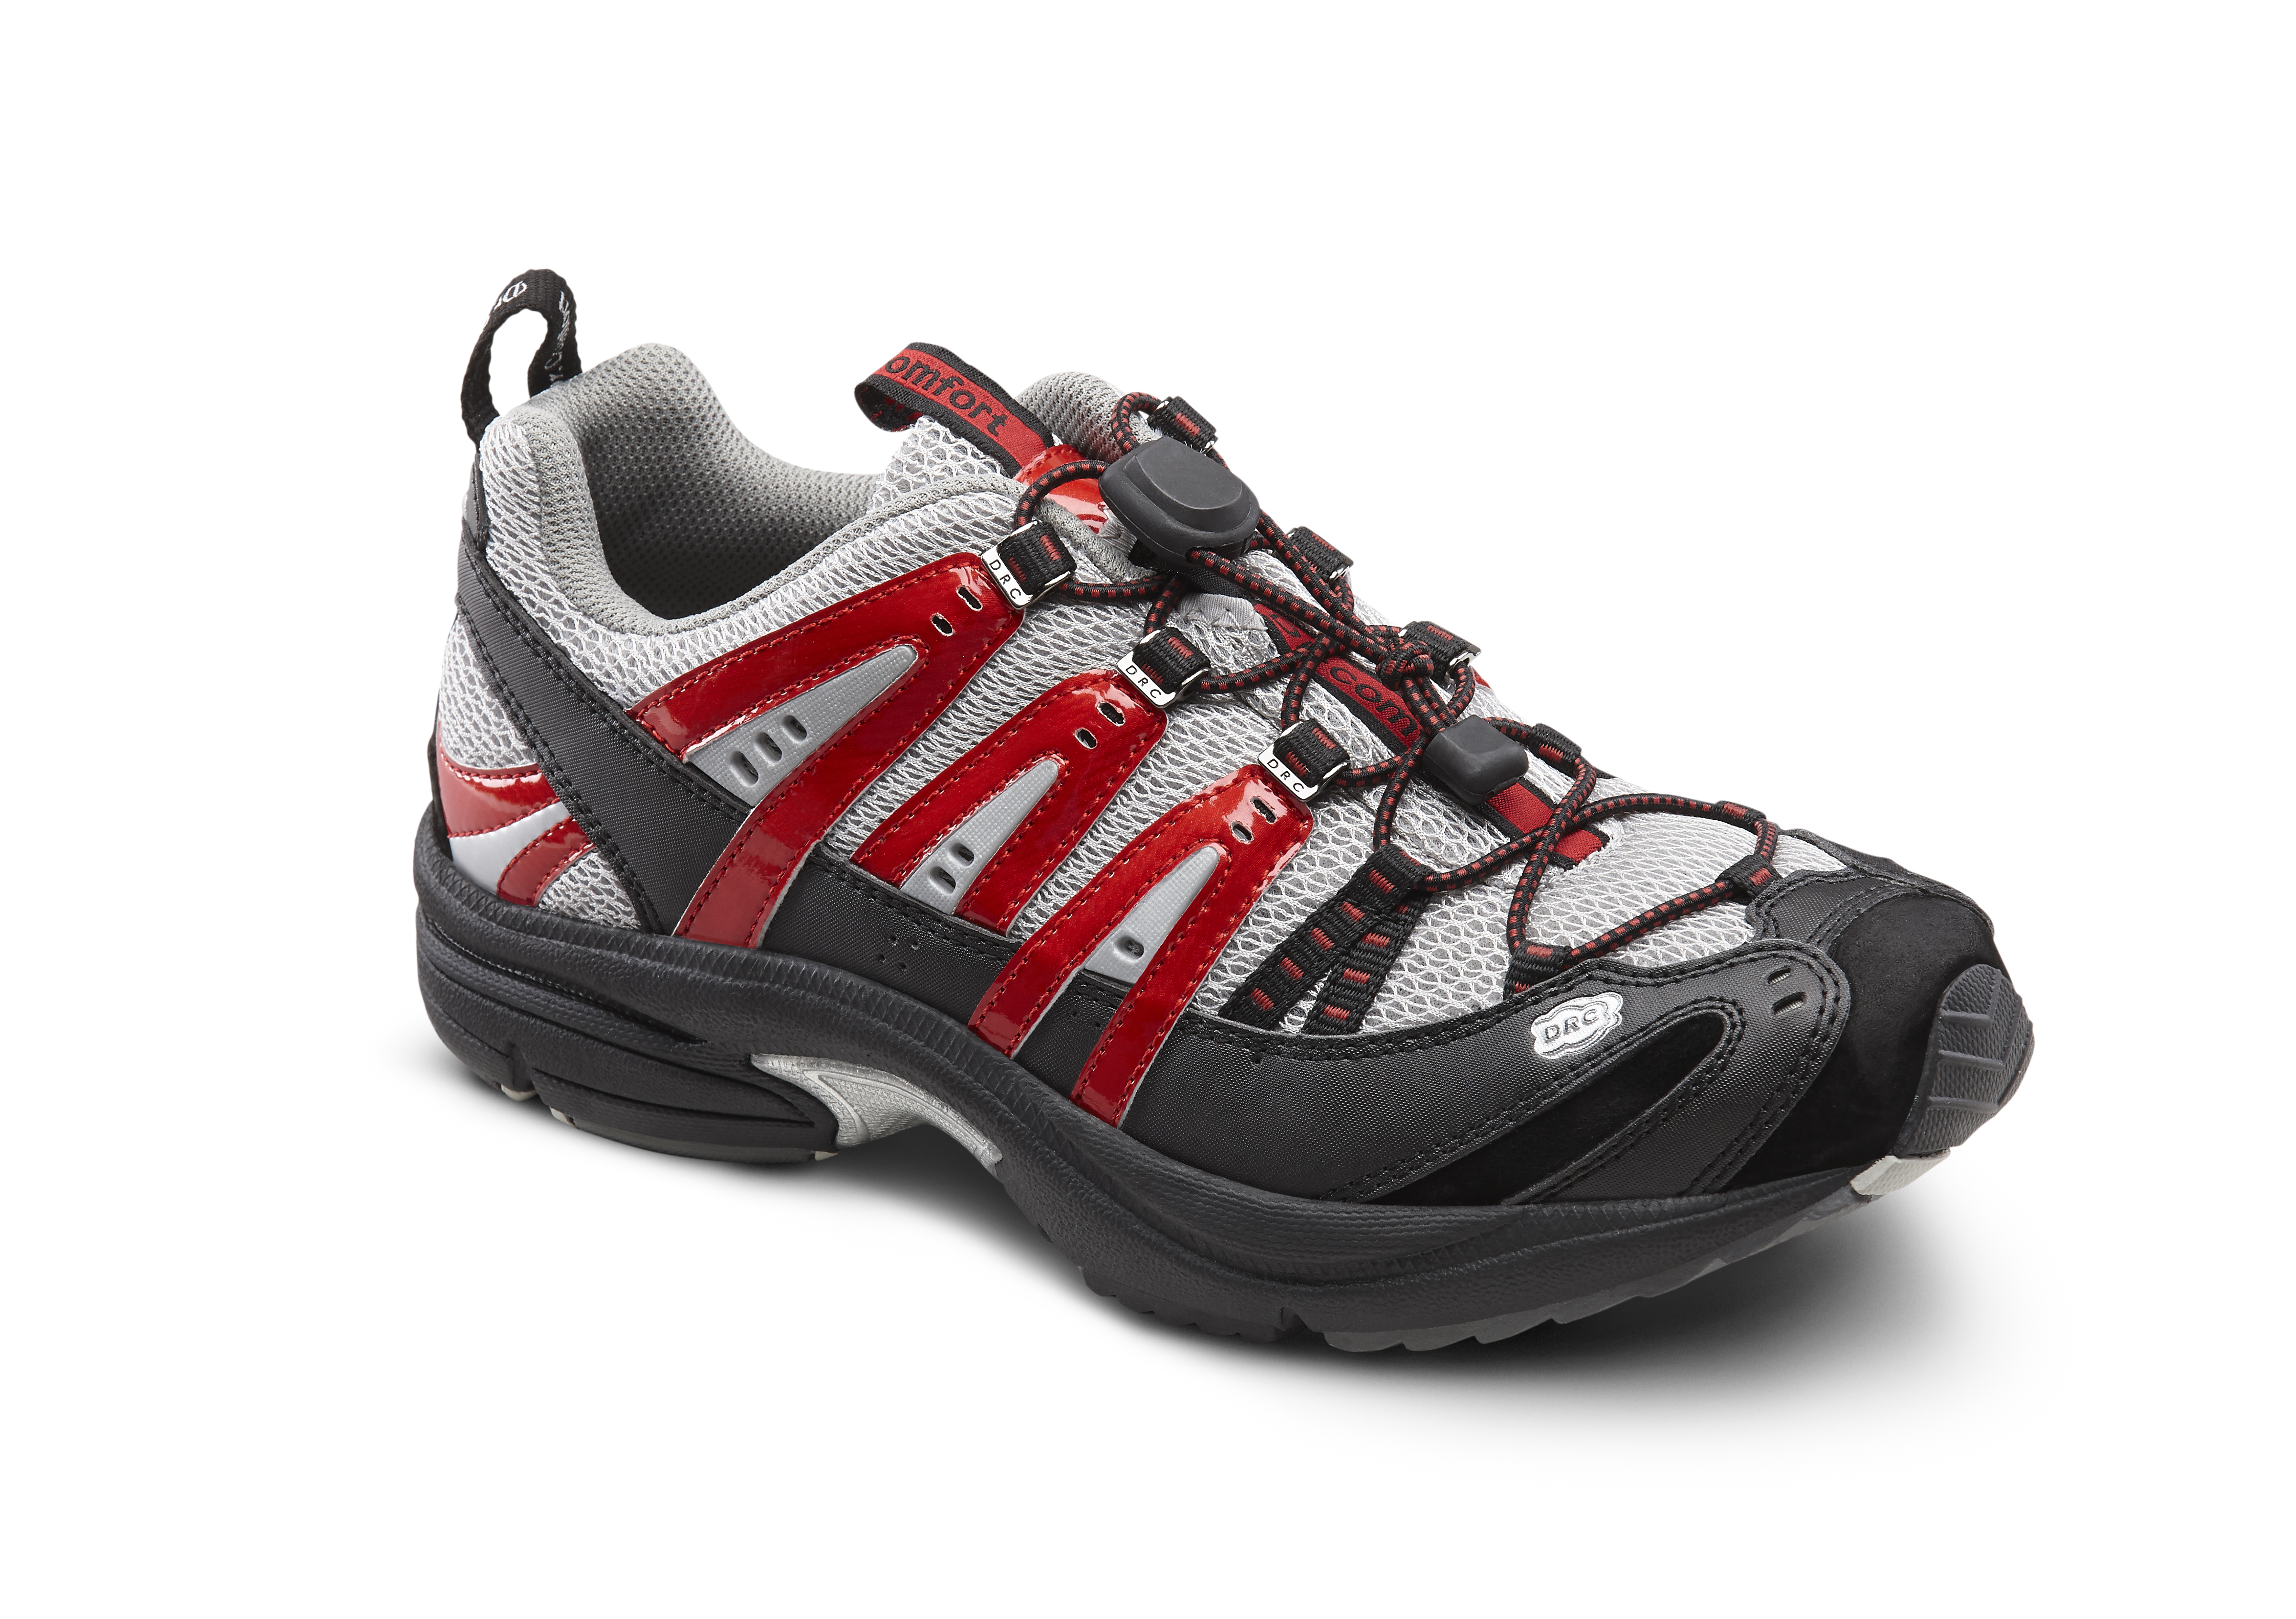 Dr. Comfort Performance Metallic Red